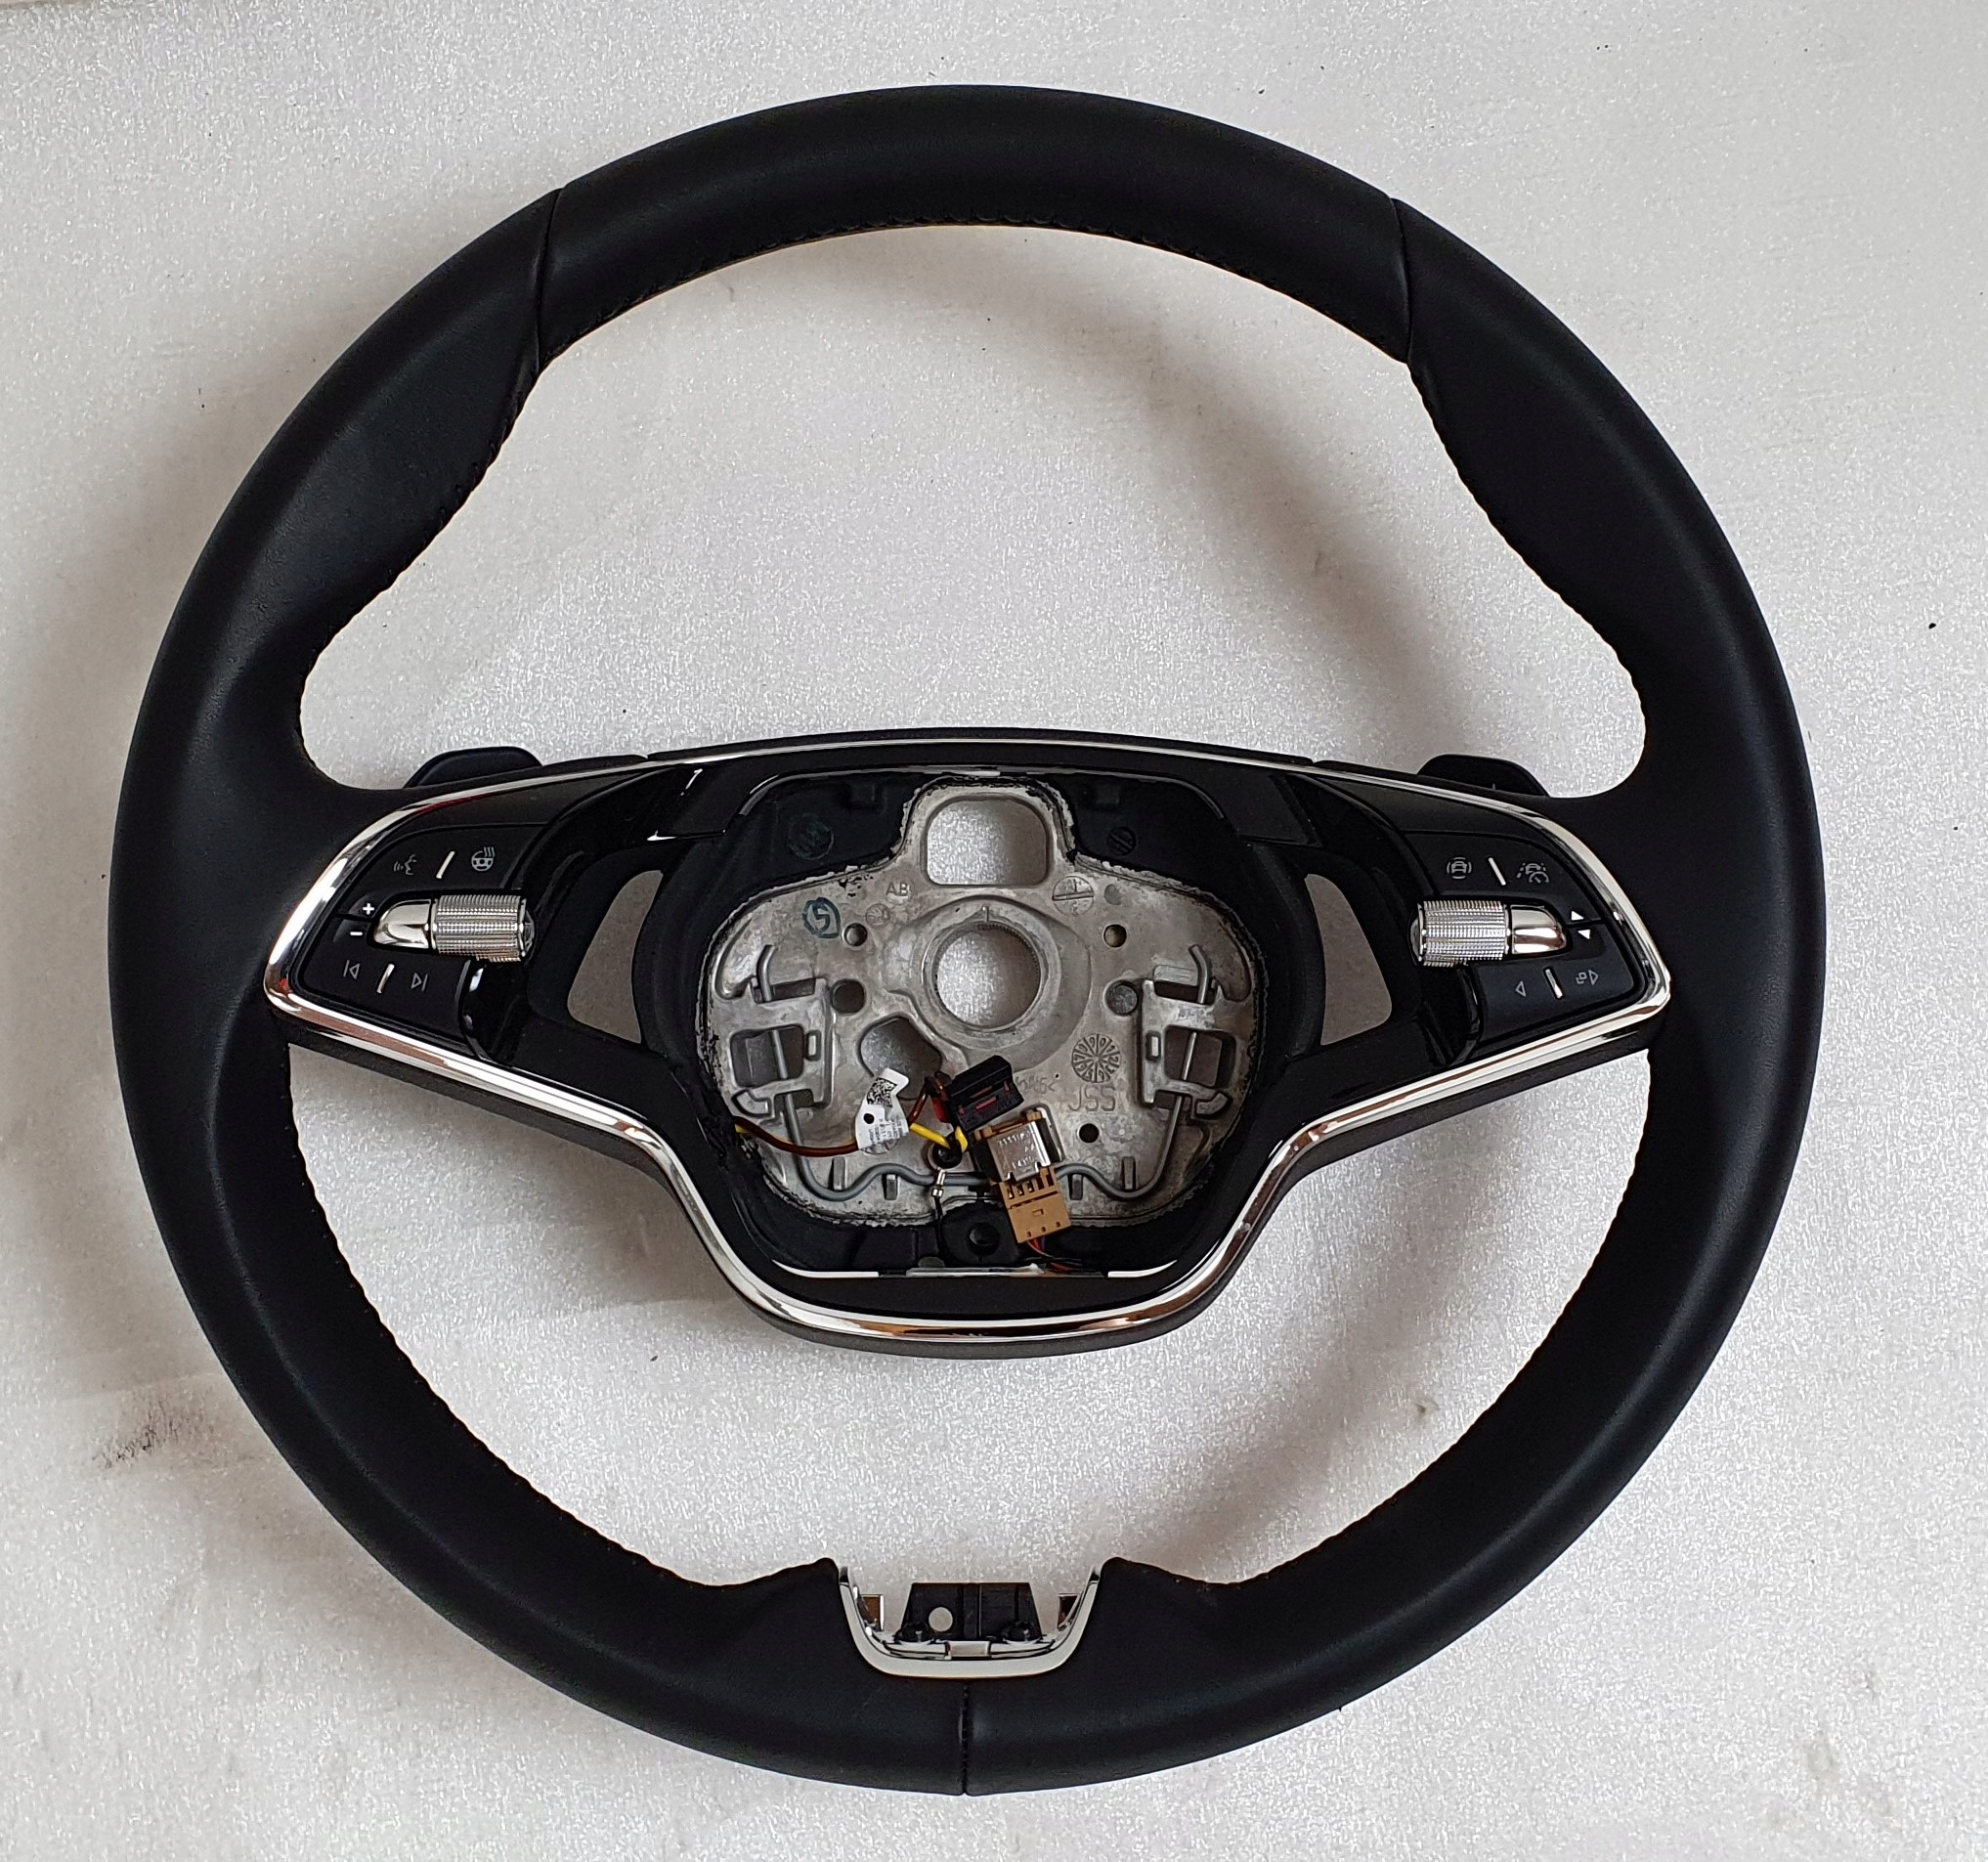 5E3419093AP руль skoda kodiaq октавия iv купить бу по цене 17160 руб. Z17396528 - iZAP24